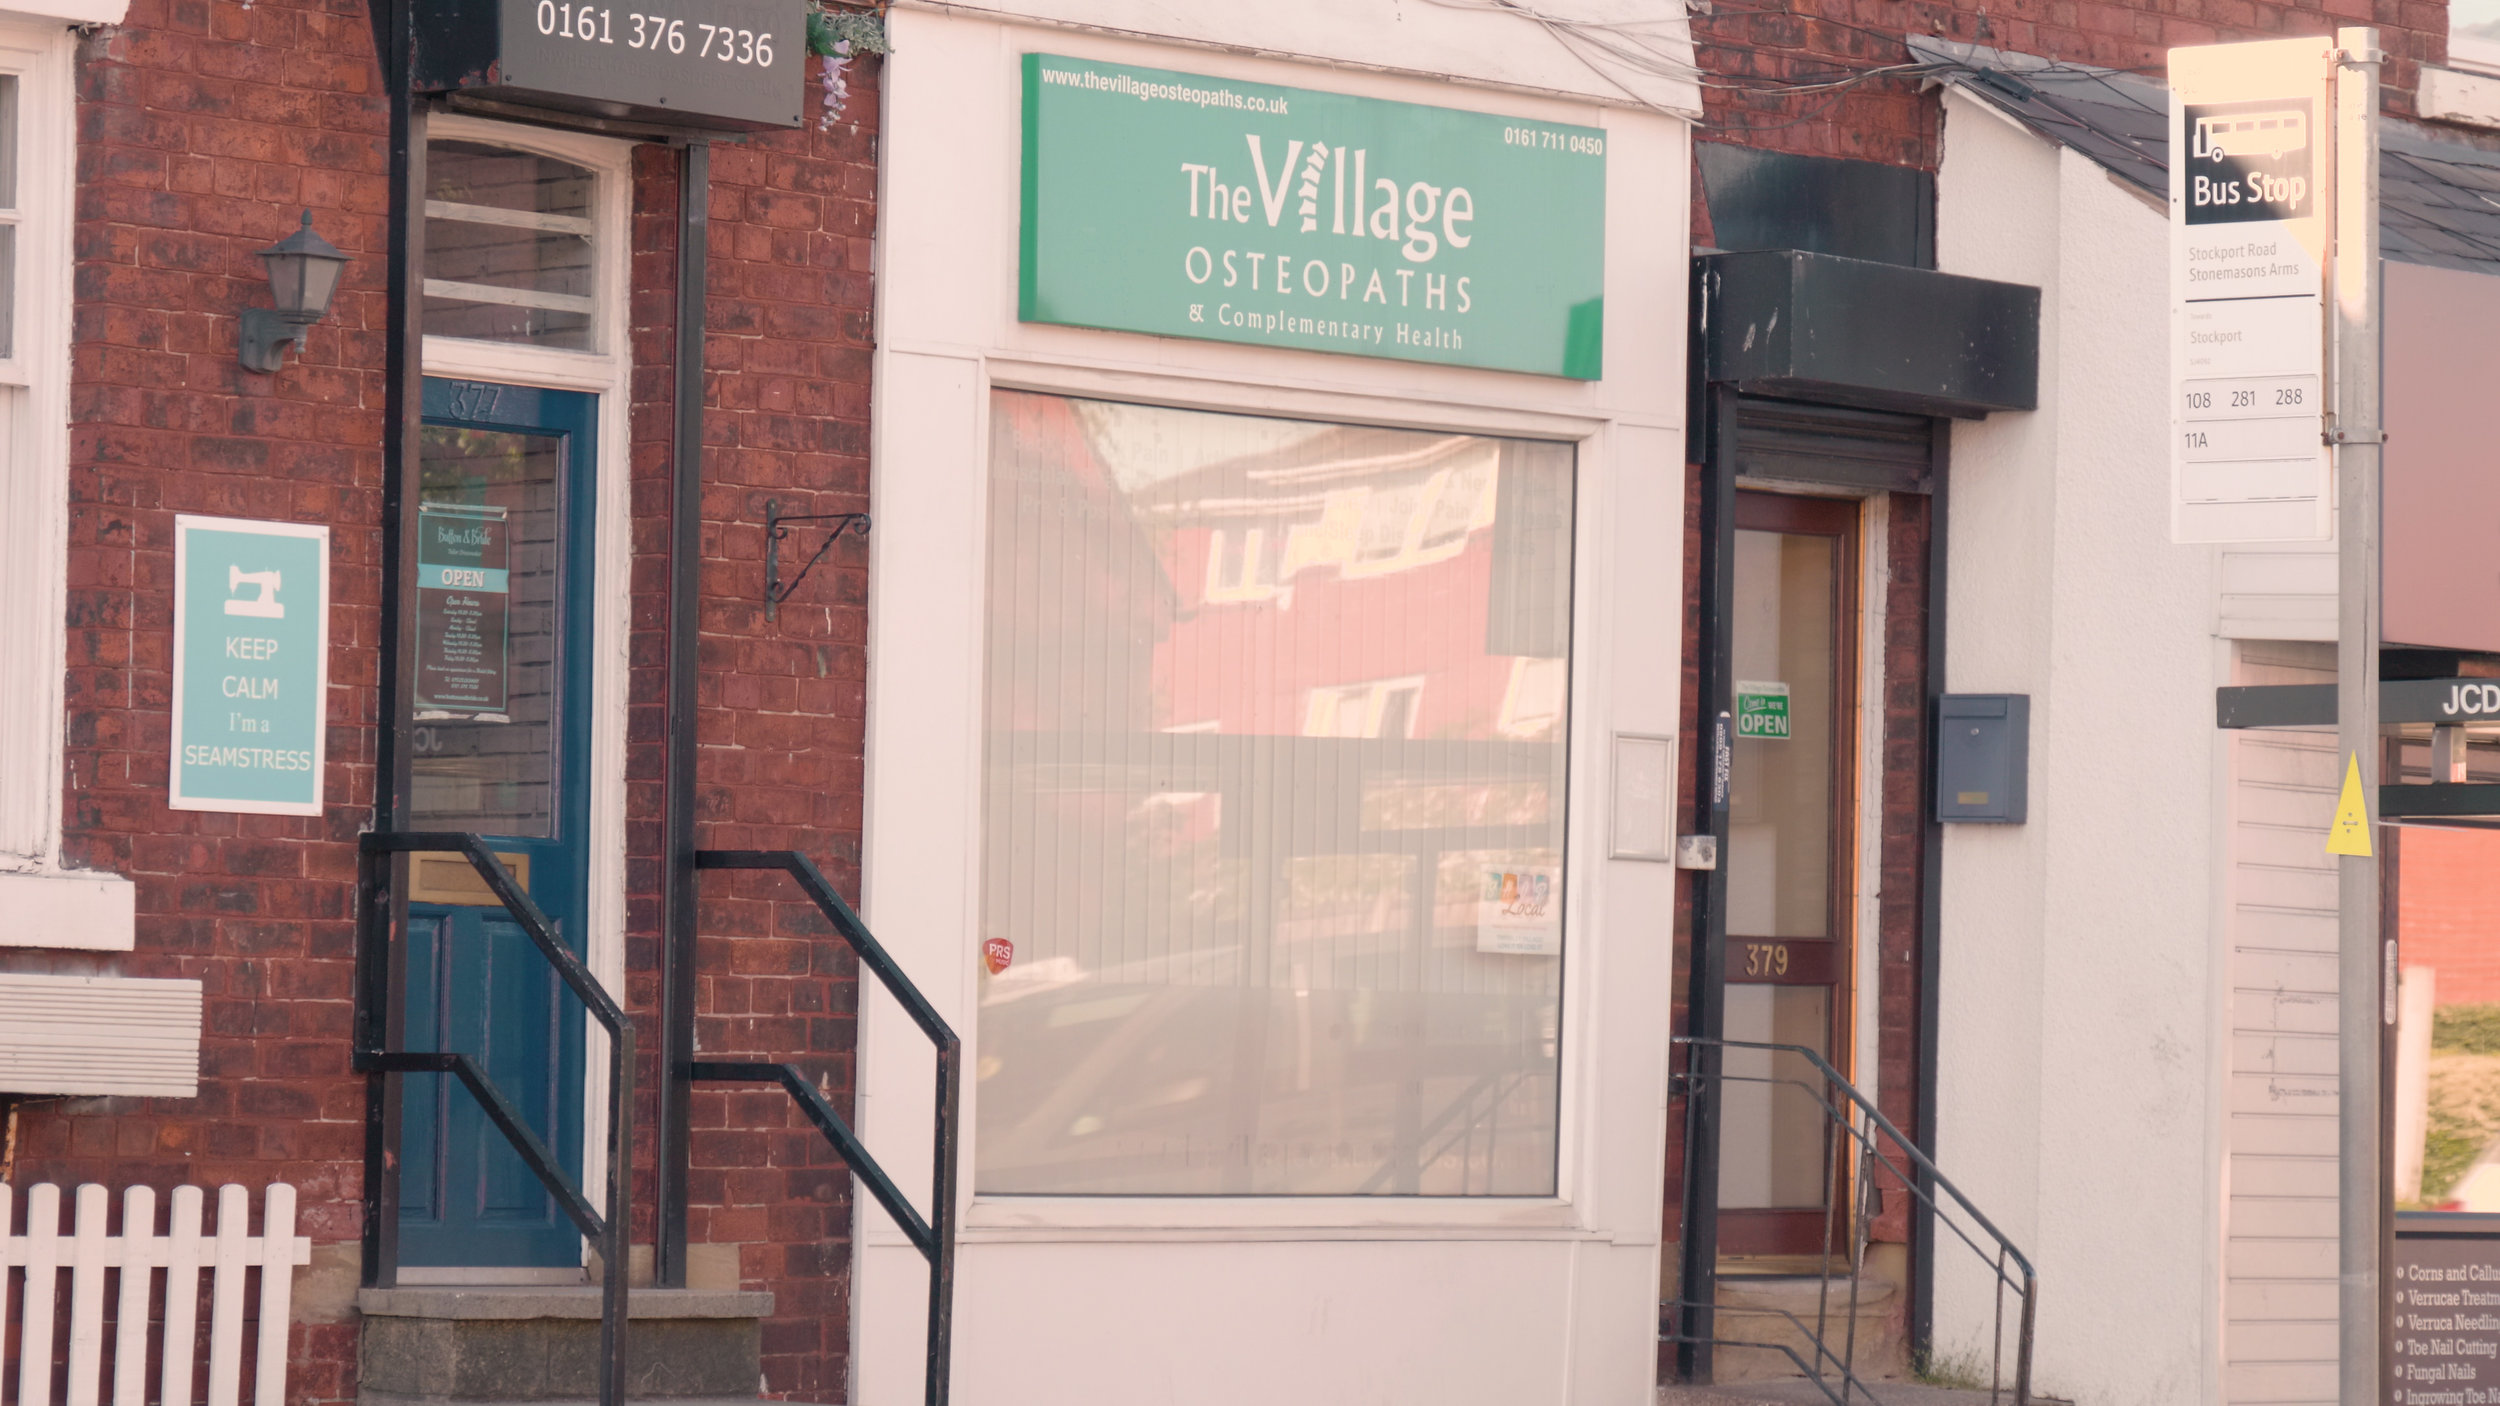 Address - 379 Stockport RoadTimperley VillageCheshireWA15 7UR